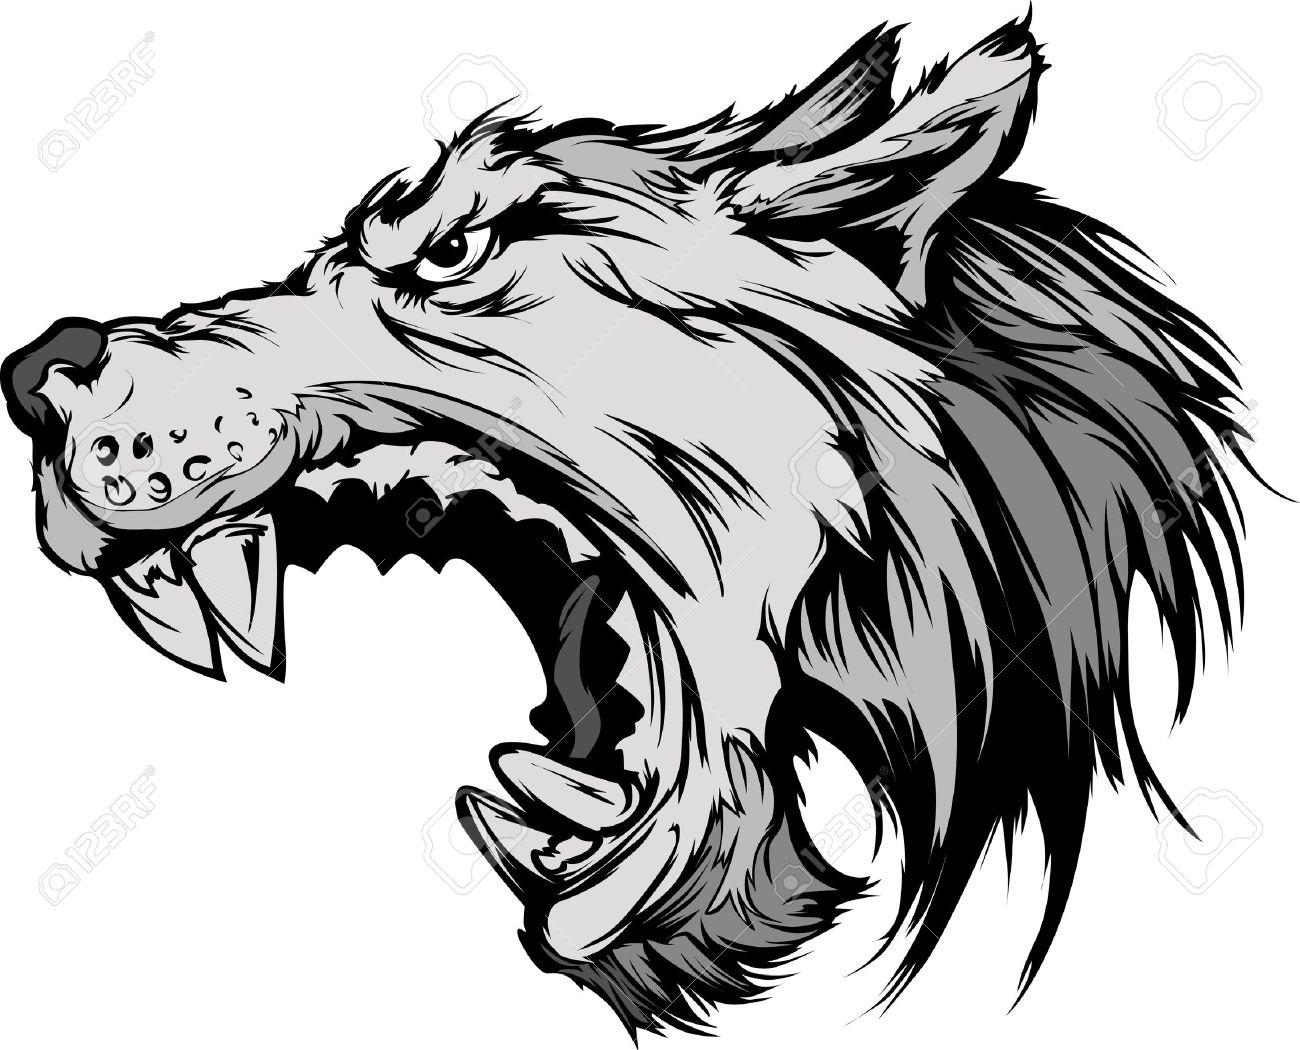 Growl: Cartoon Vector Mascot Image Of A Growling Grey Wolf Head